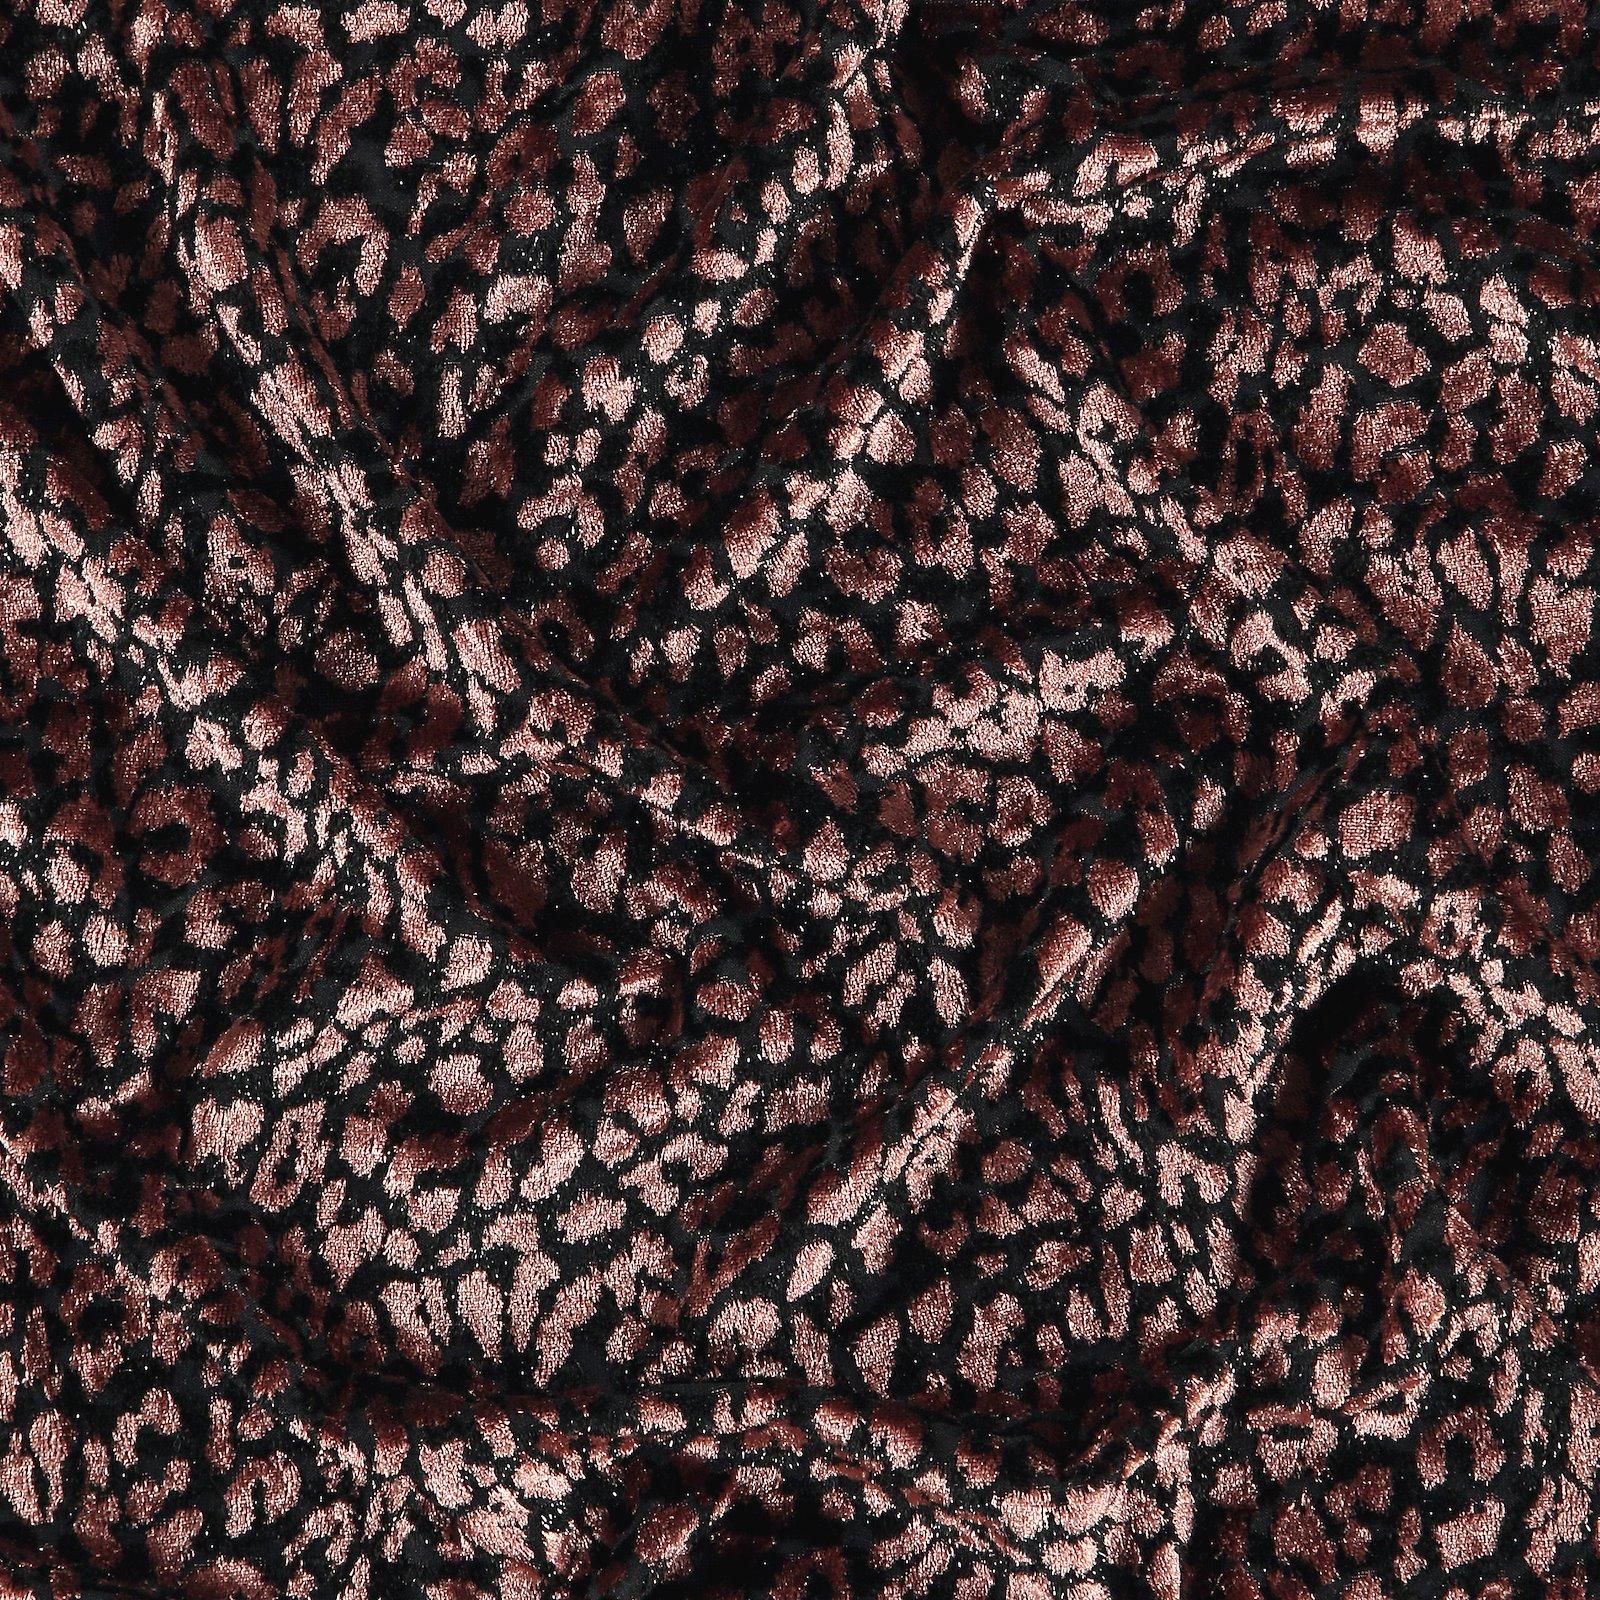 Burnout velour chestnut w animal print 250757_pack